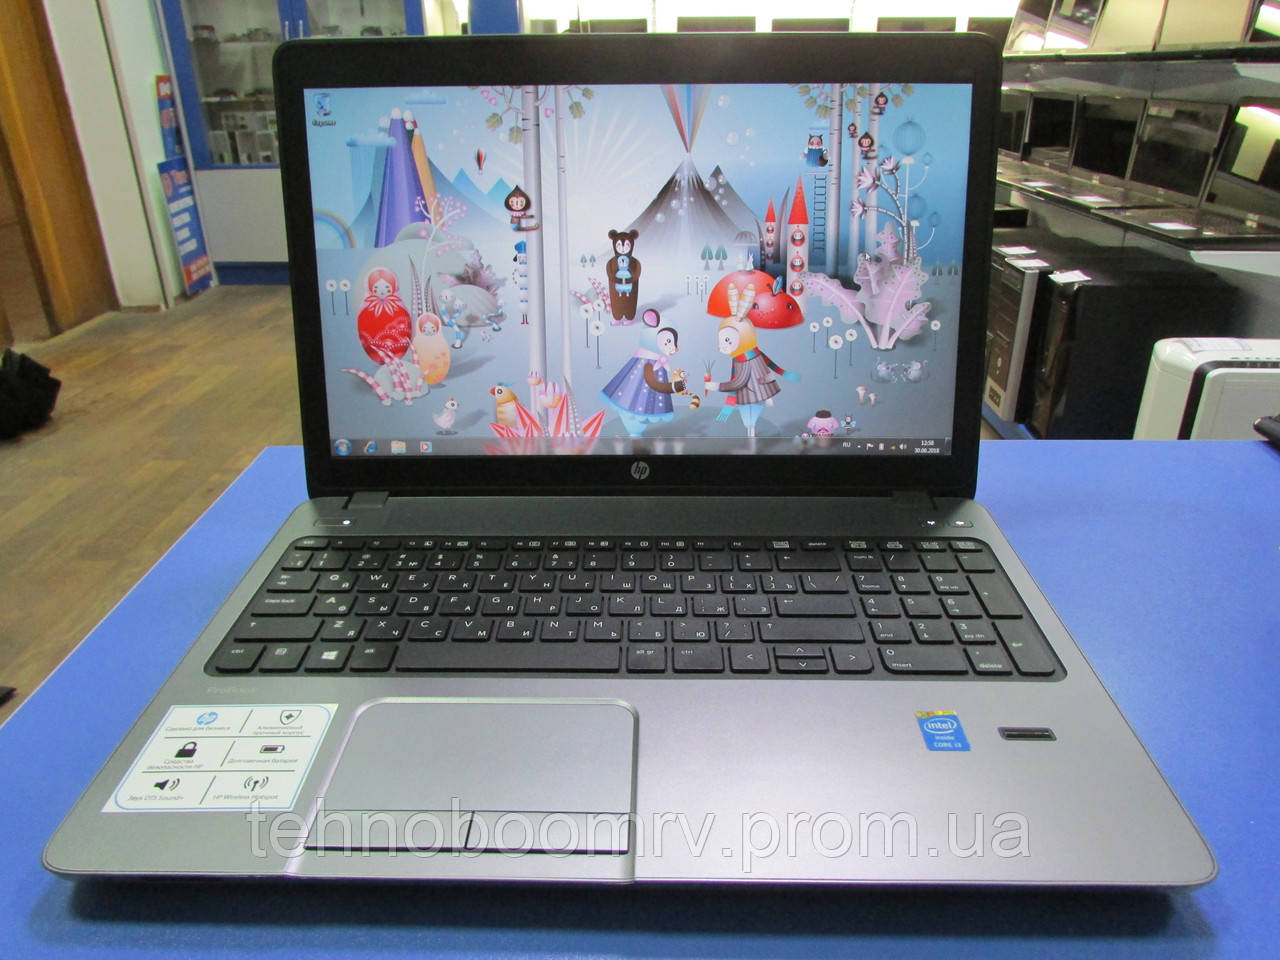 Бизнес HP ProBook 450 G1 - Intel i3-4000M 2.4GHz/Intel HD/DDR3 4GB